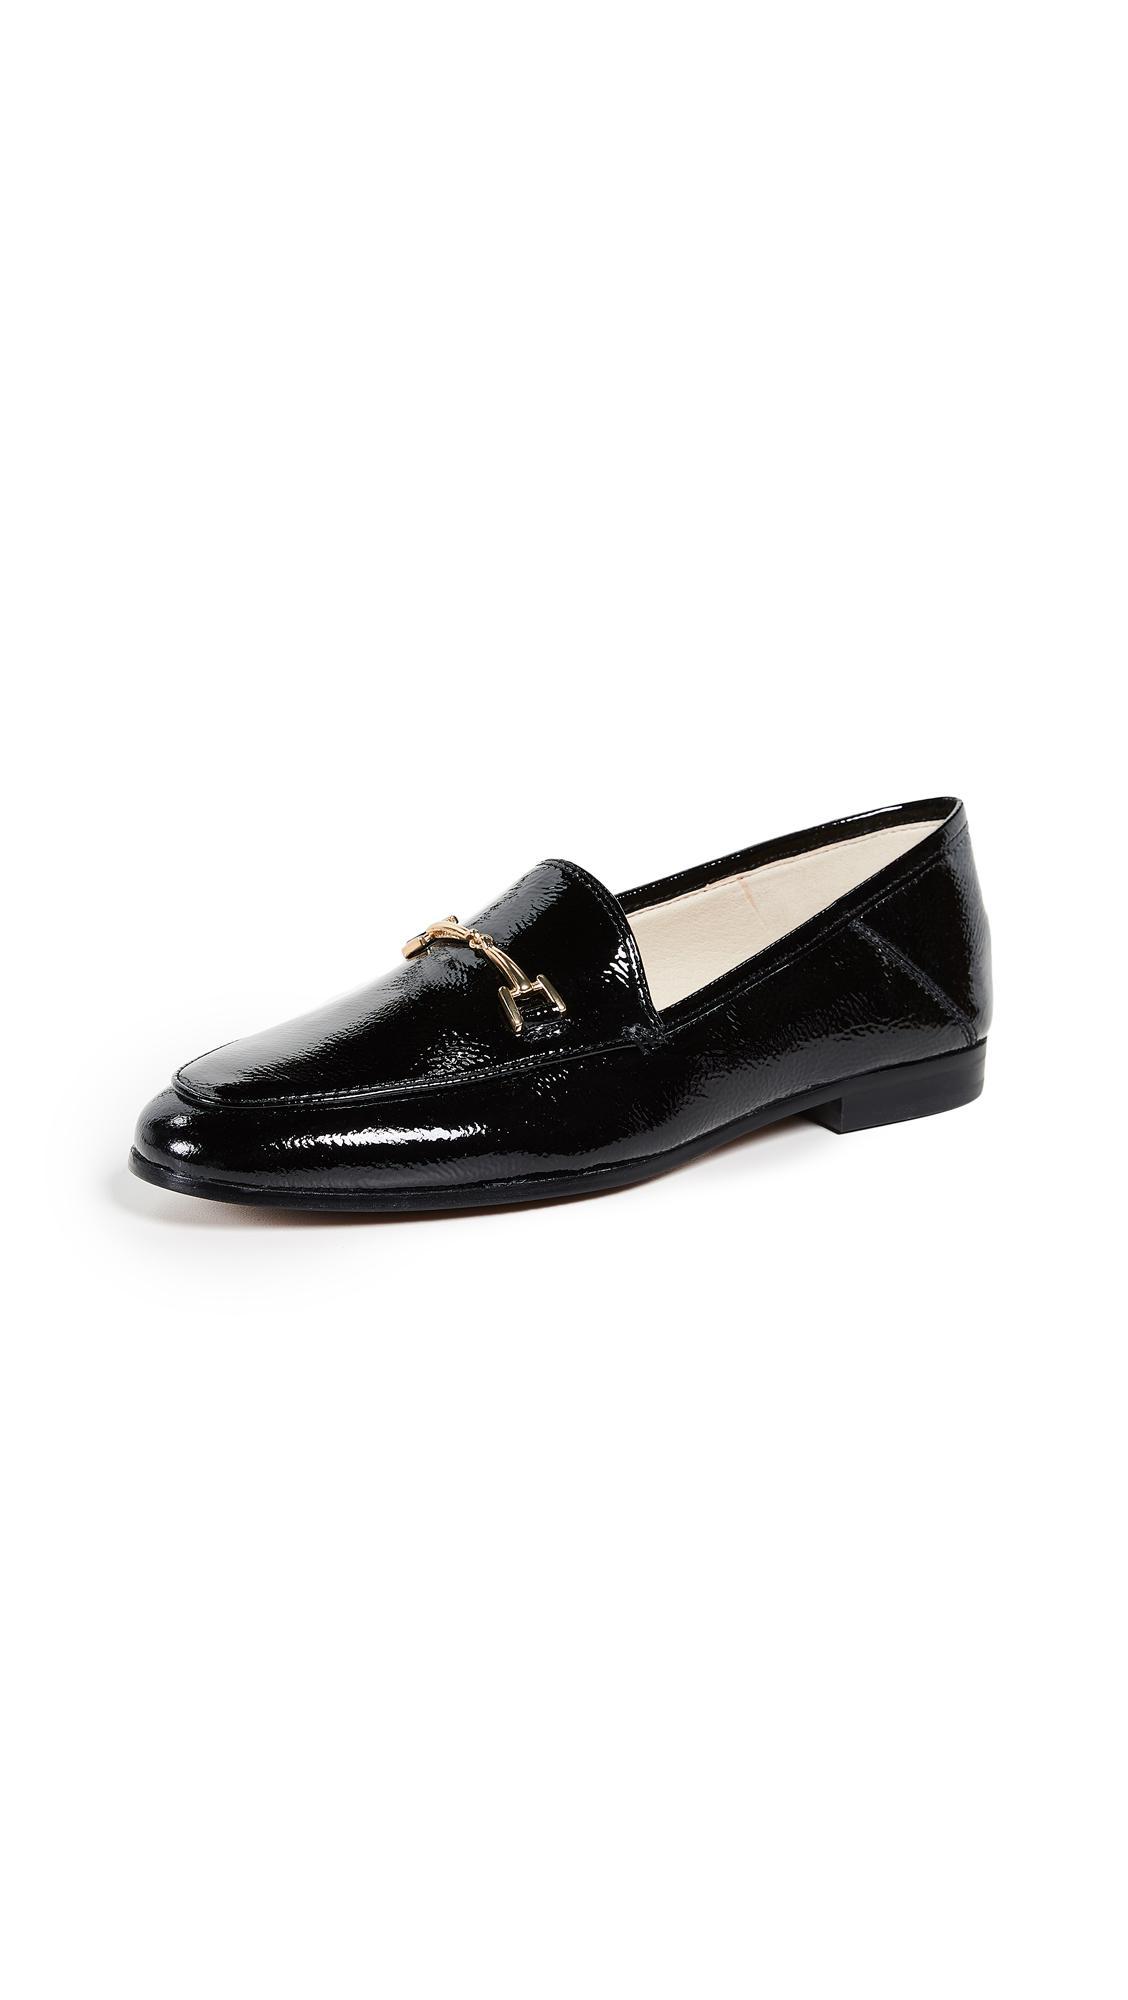 7eb29d71f94 Sam Edelman Loraine Black Patent Leather Loafers